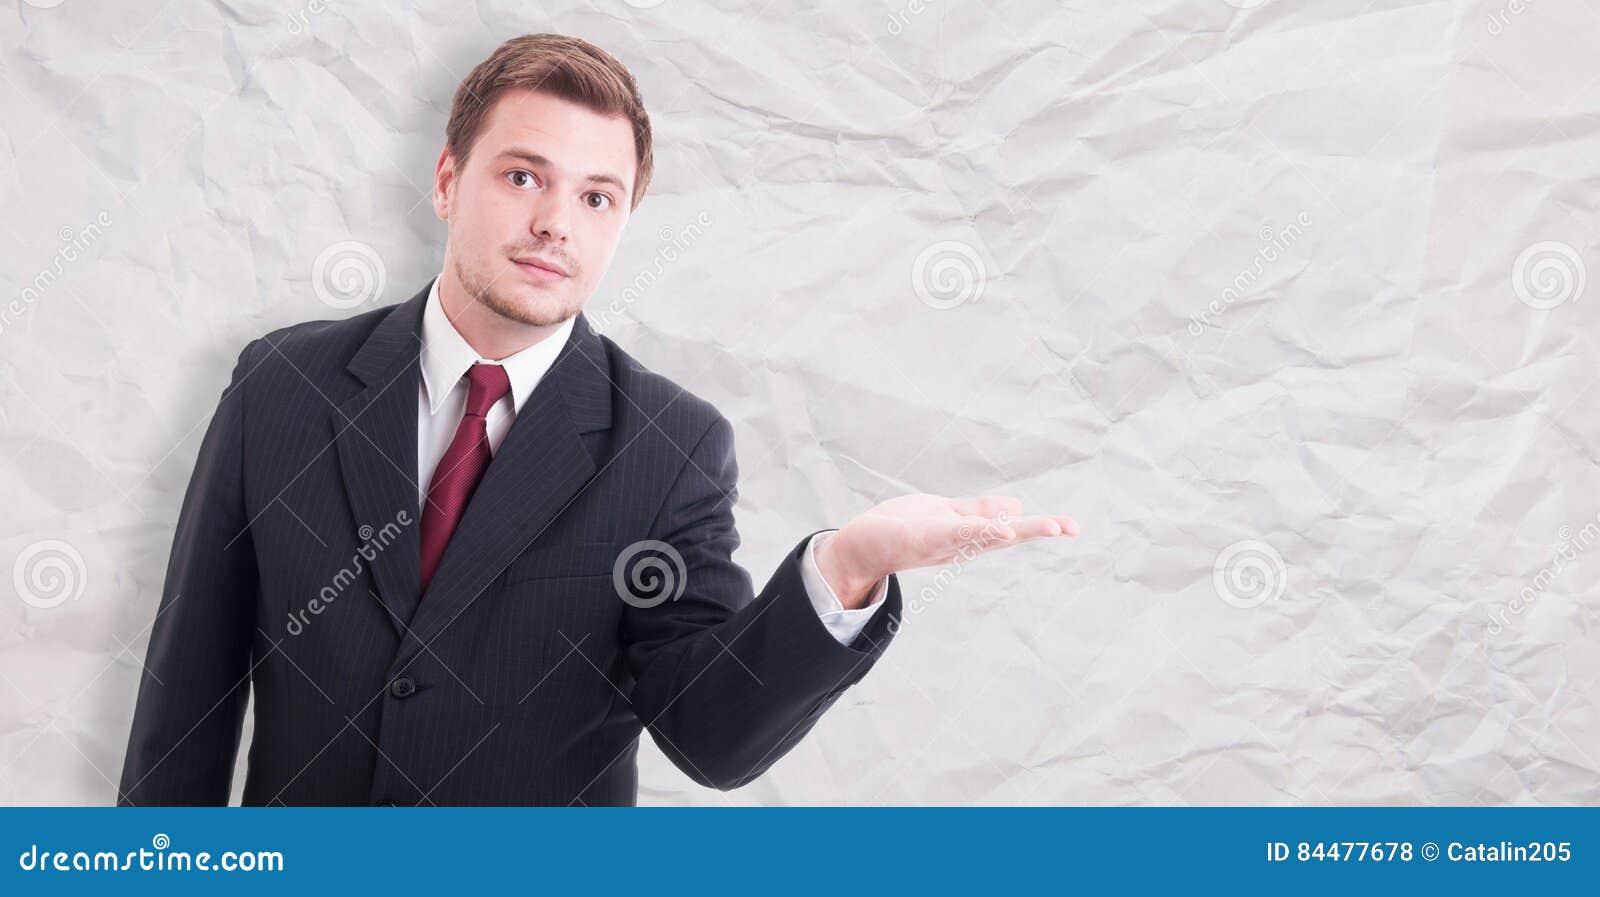 Retrato do executivo masculino que introduz algo